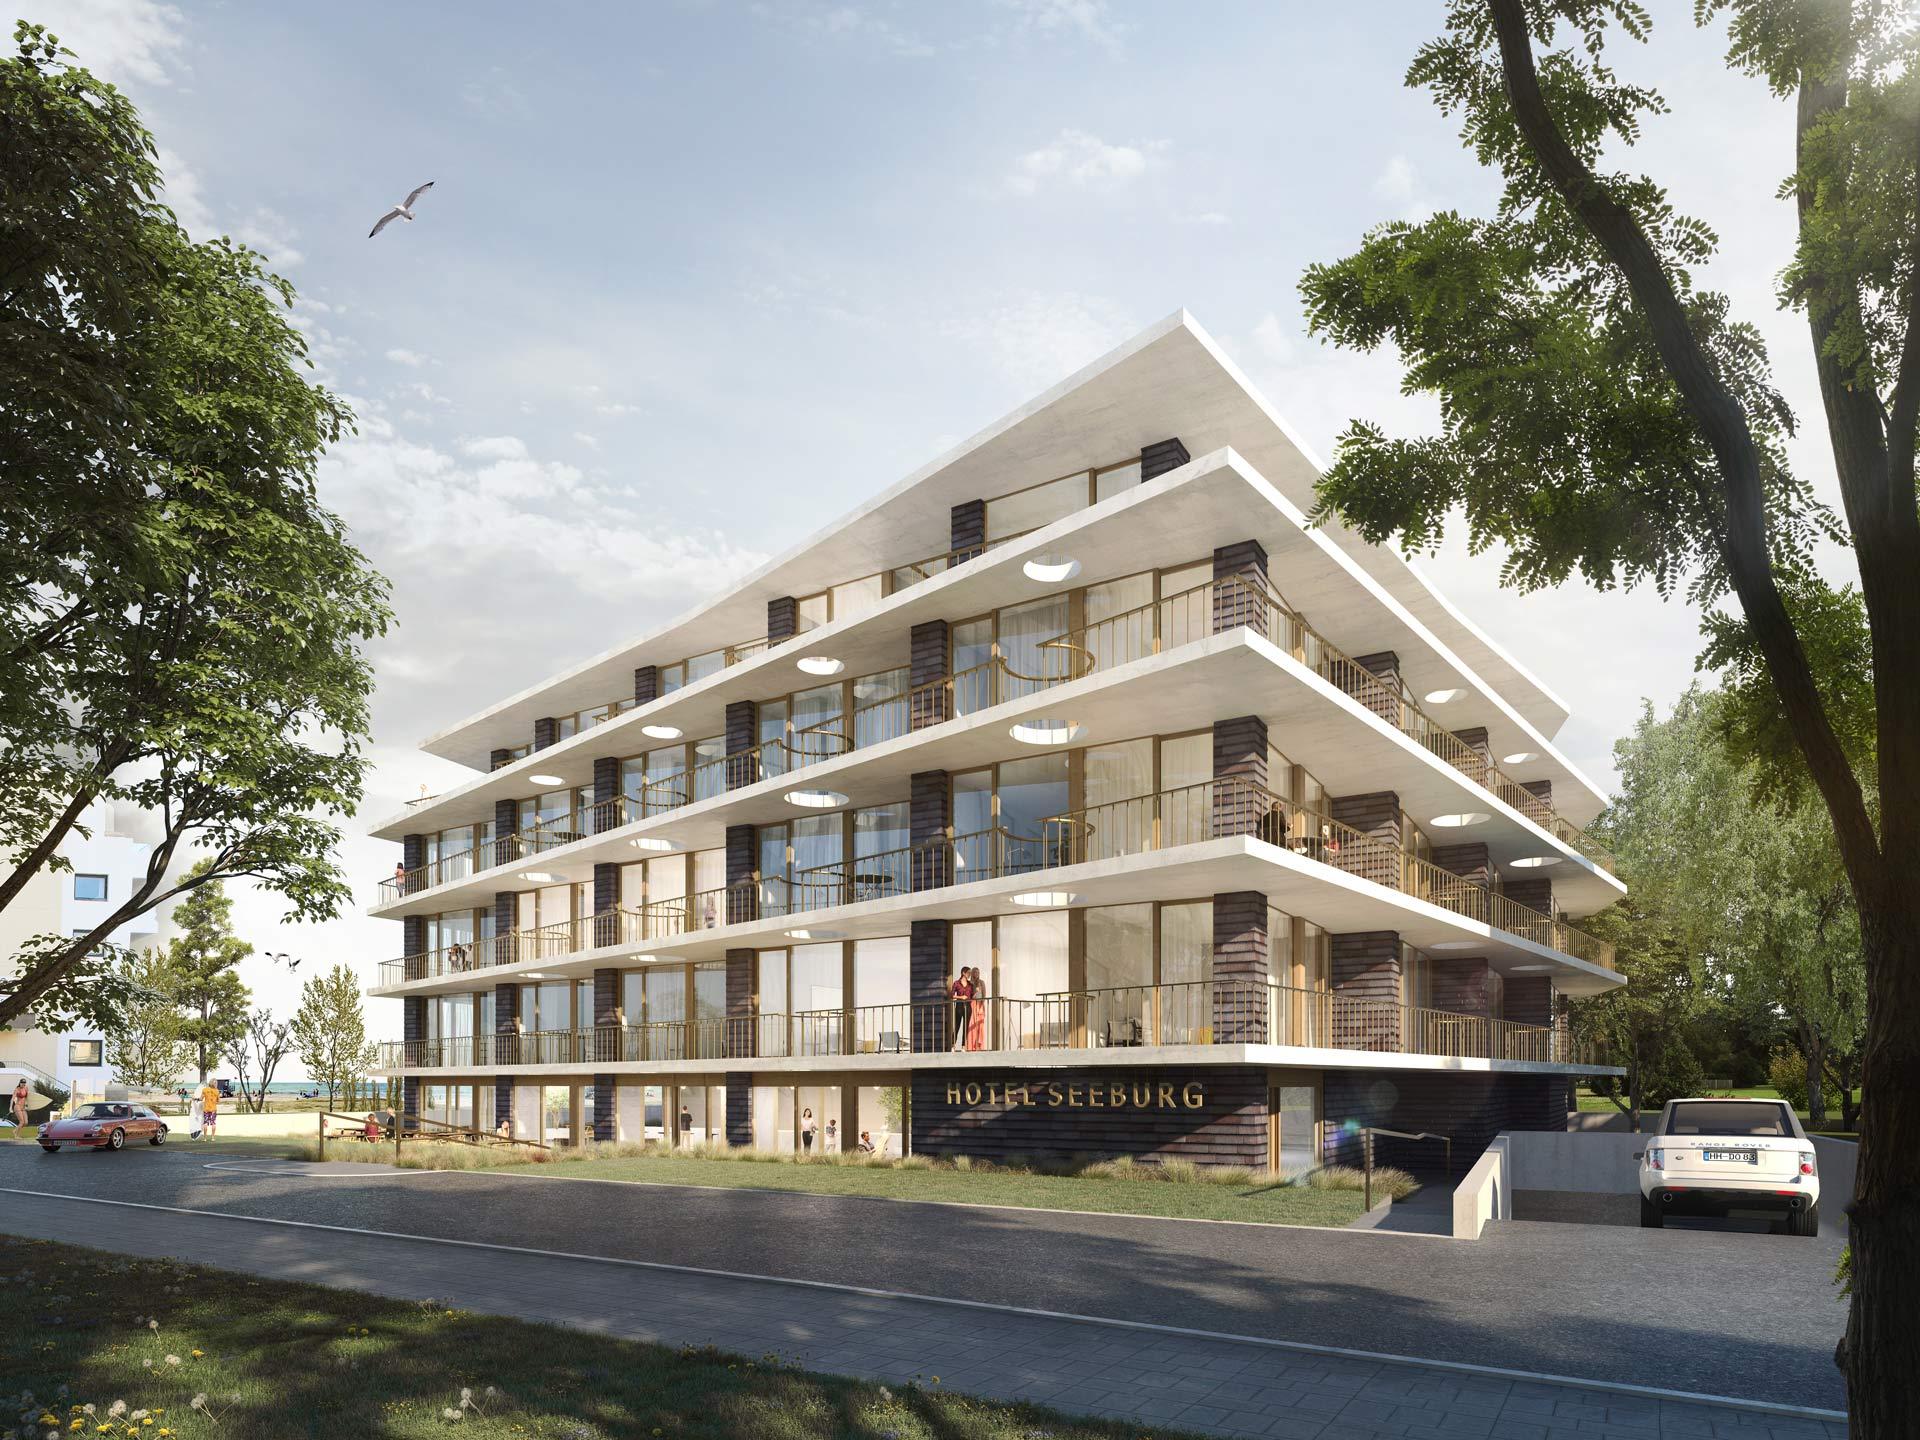 Hotel Seeburg - Limbrock Tubbesing Architekten